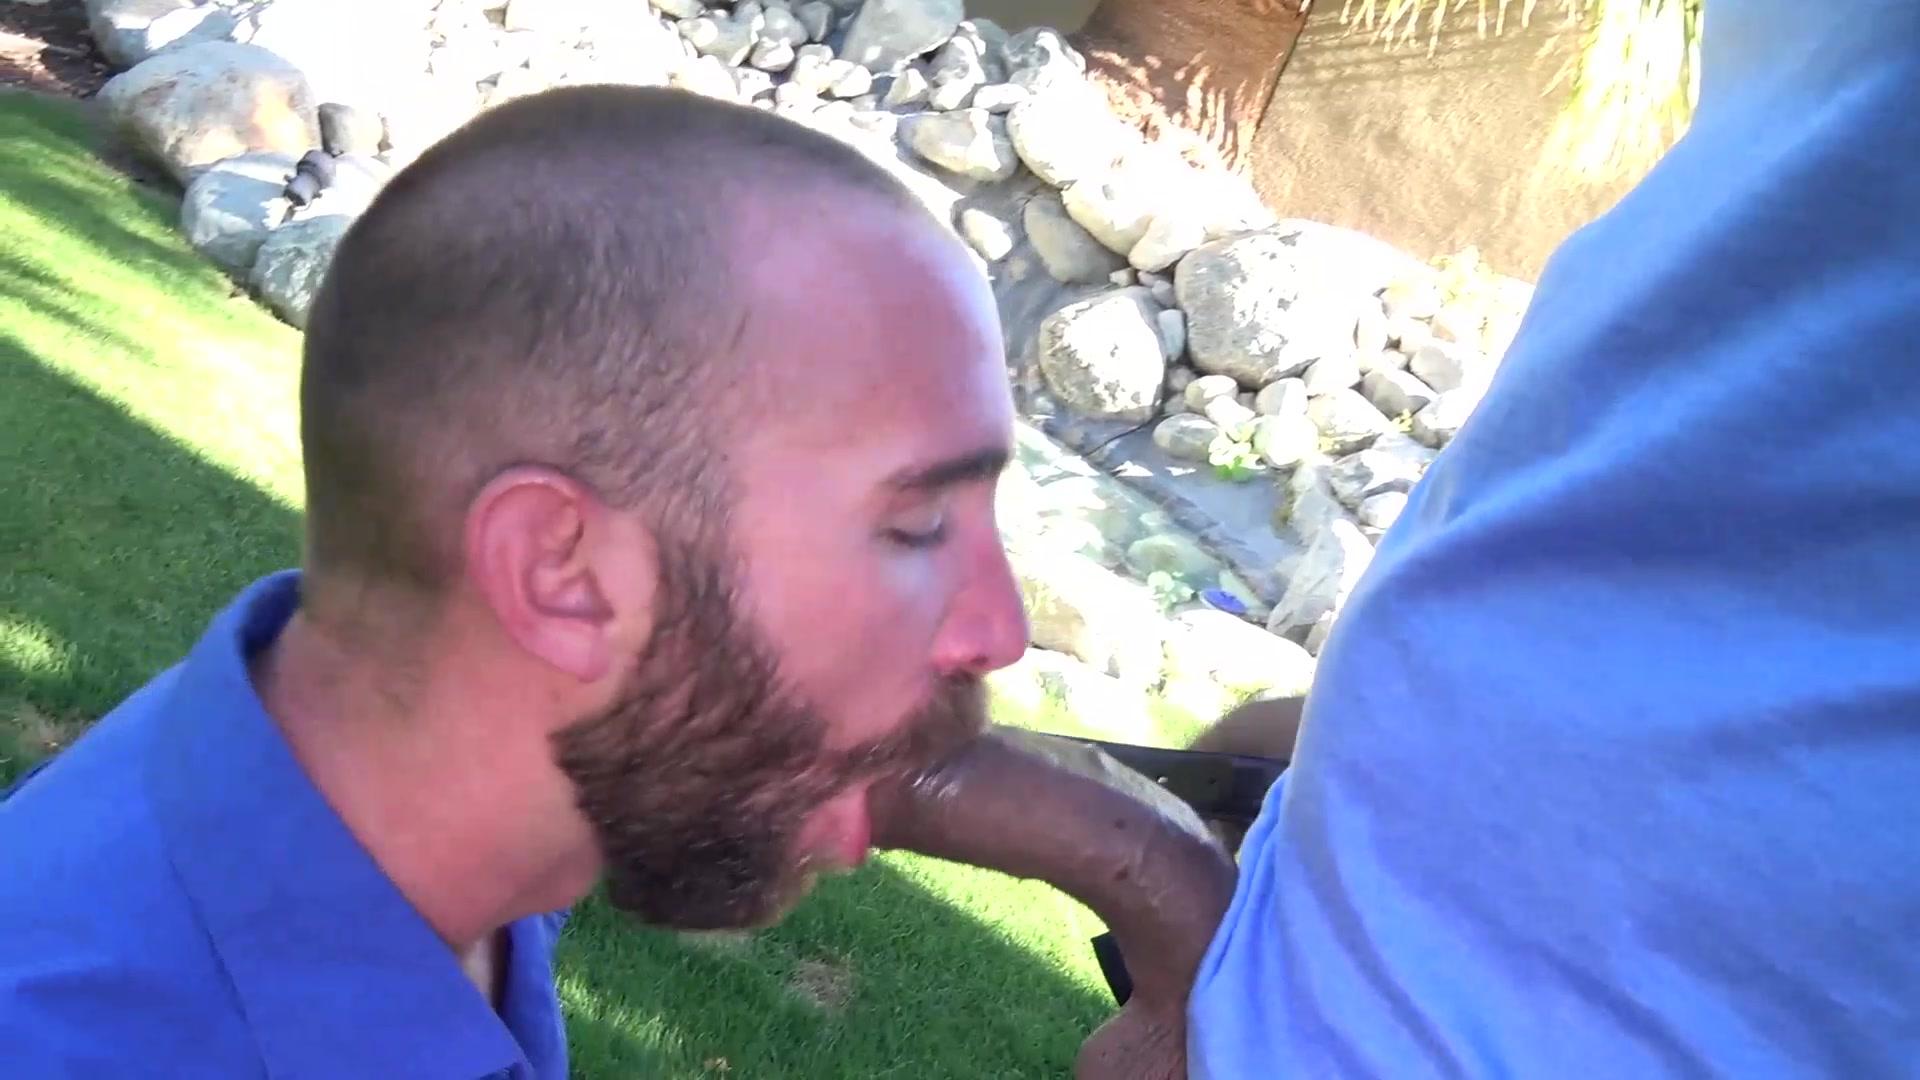 guy-porn-videos-no-membership-girl-sucking-dick-during-sex